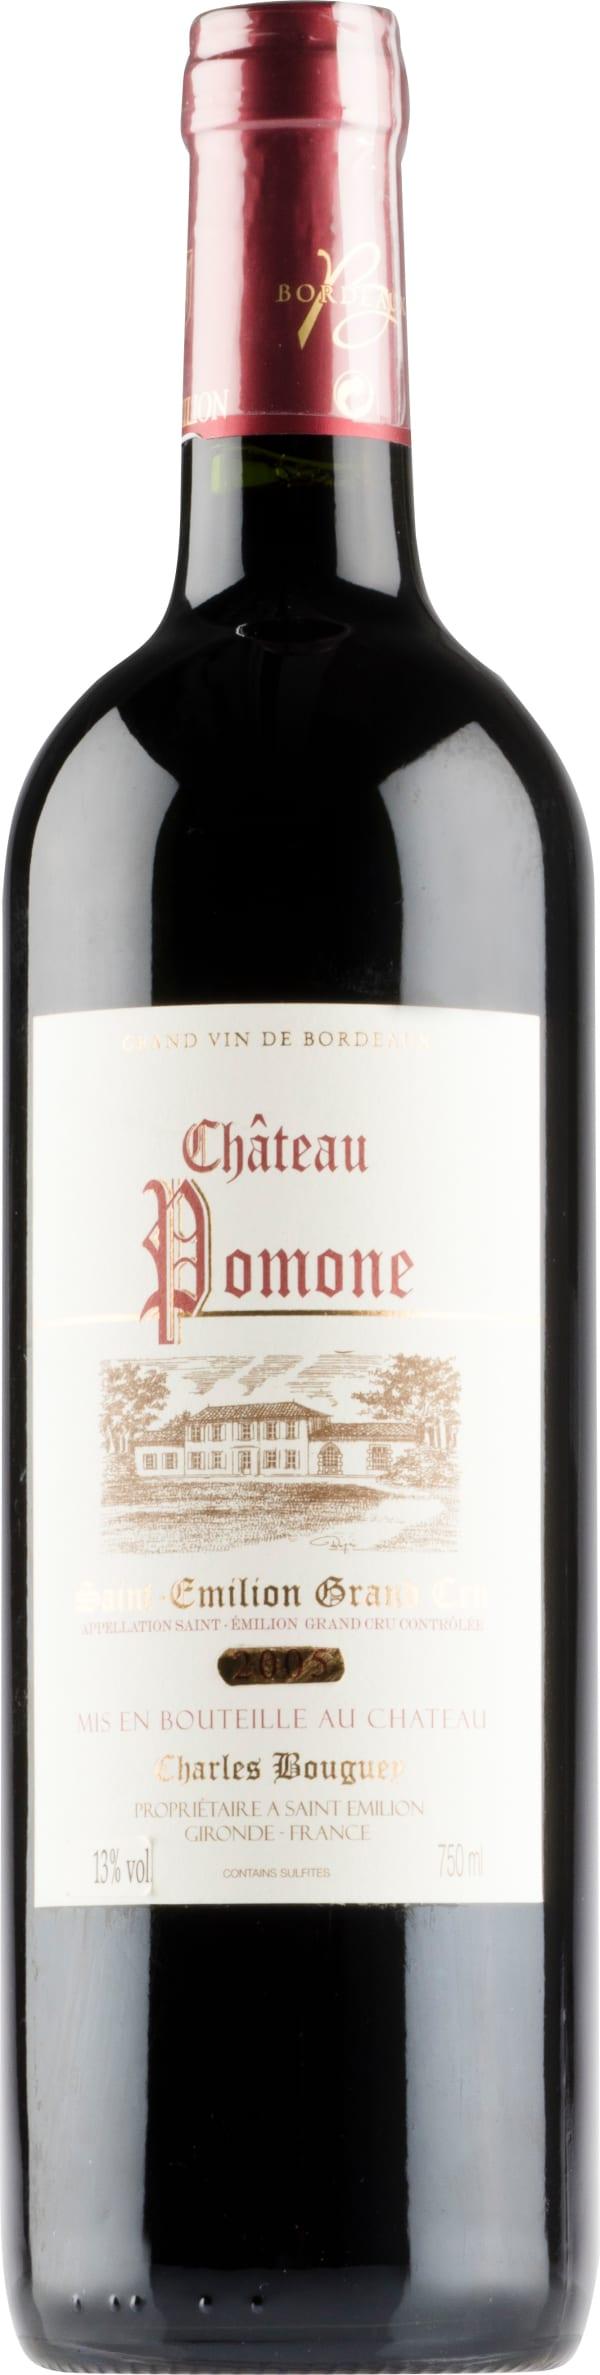 Château Pomone 2008